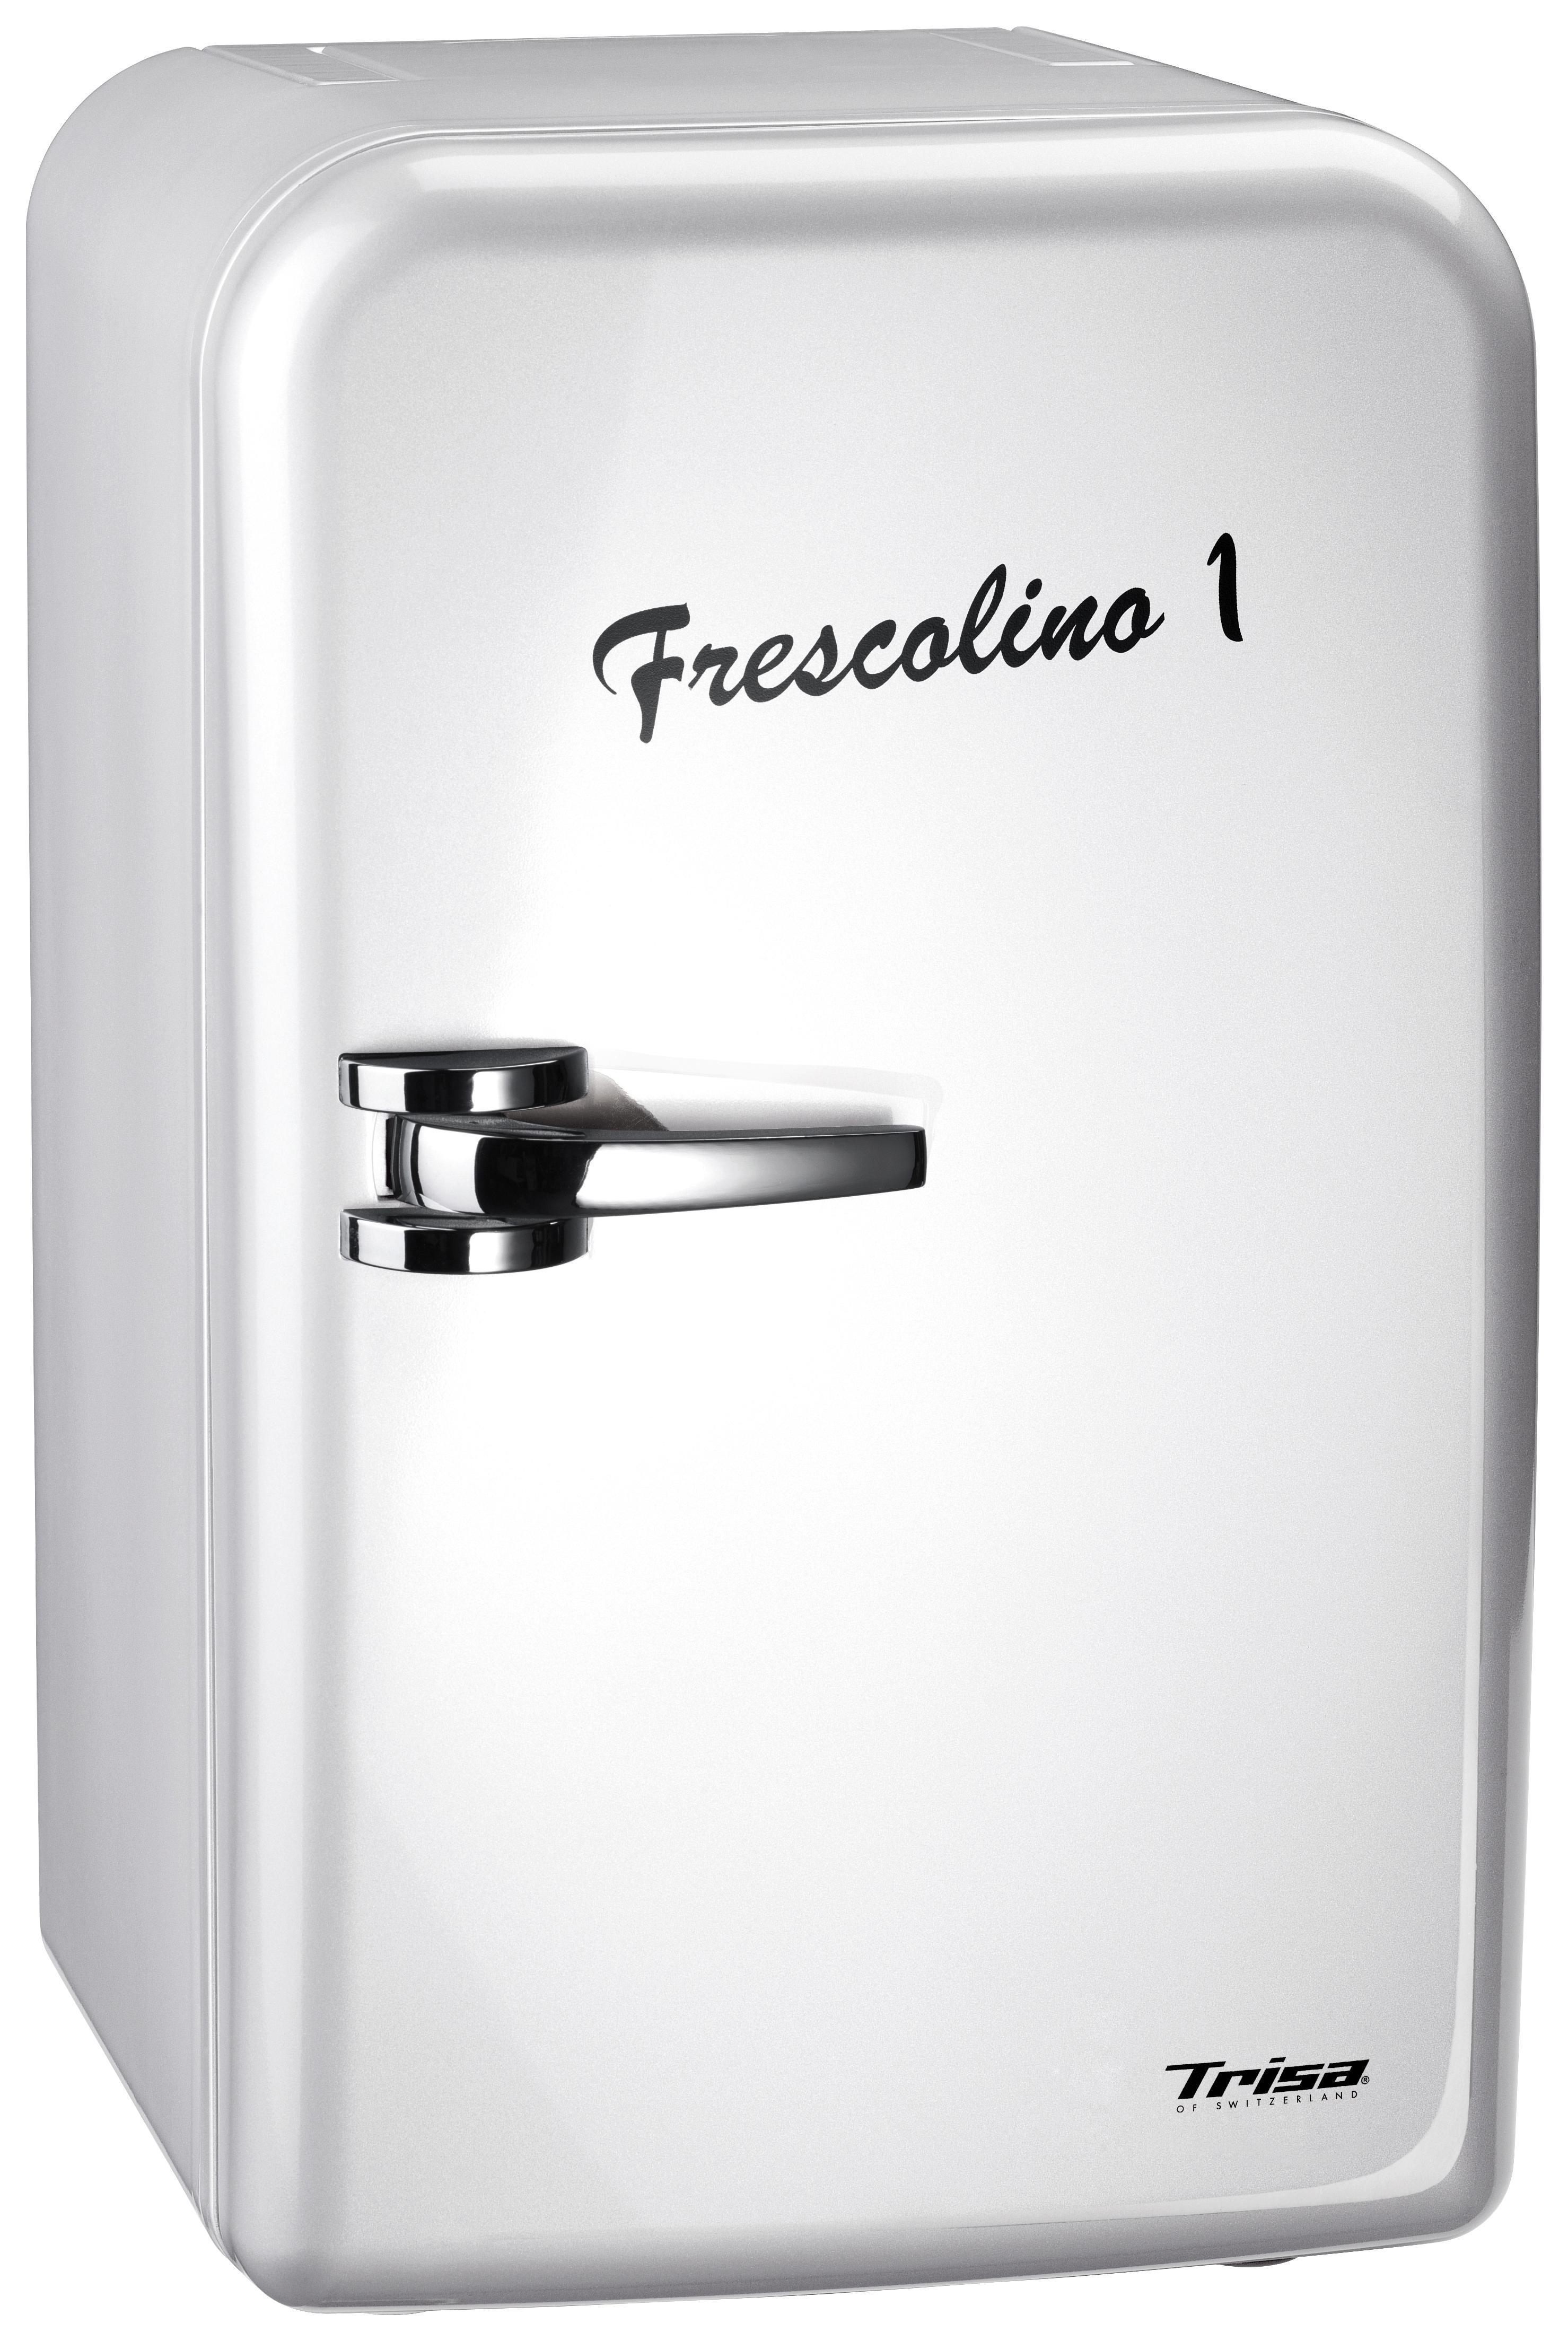 Mini Kühlschrank Für Bar : Minikühlschrank frescolino online kaufen ➤ möbelix